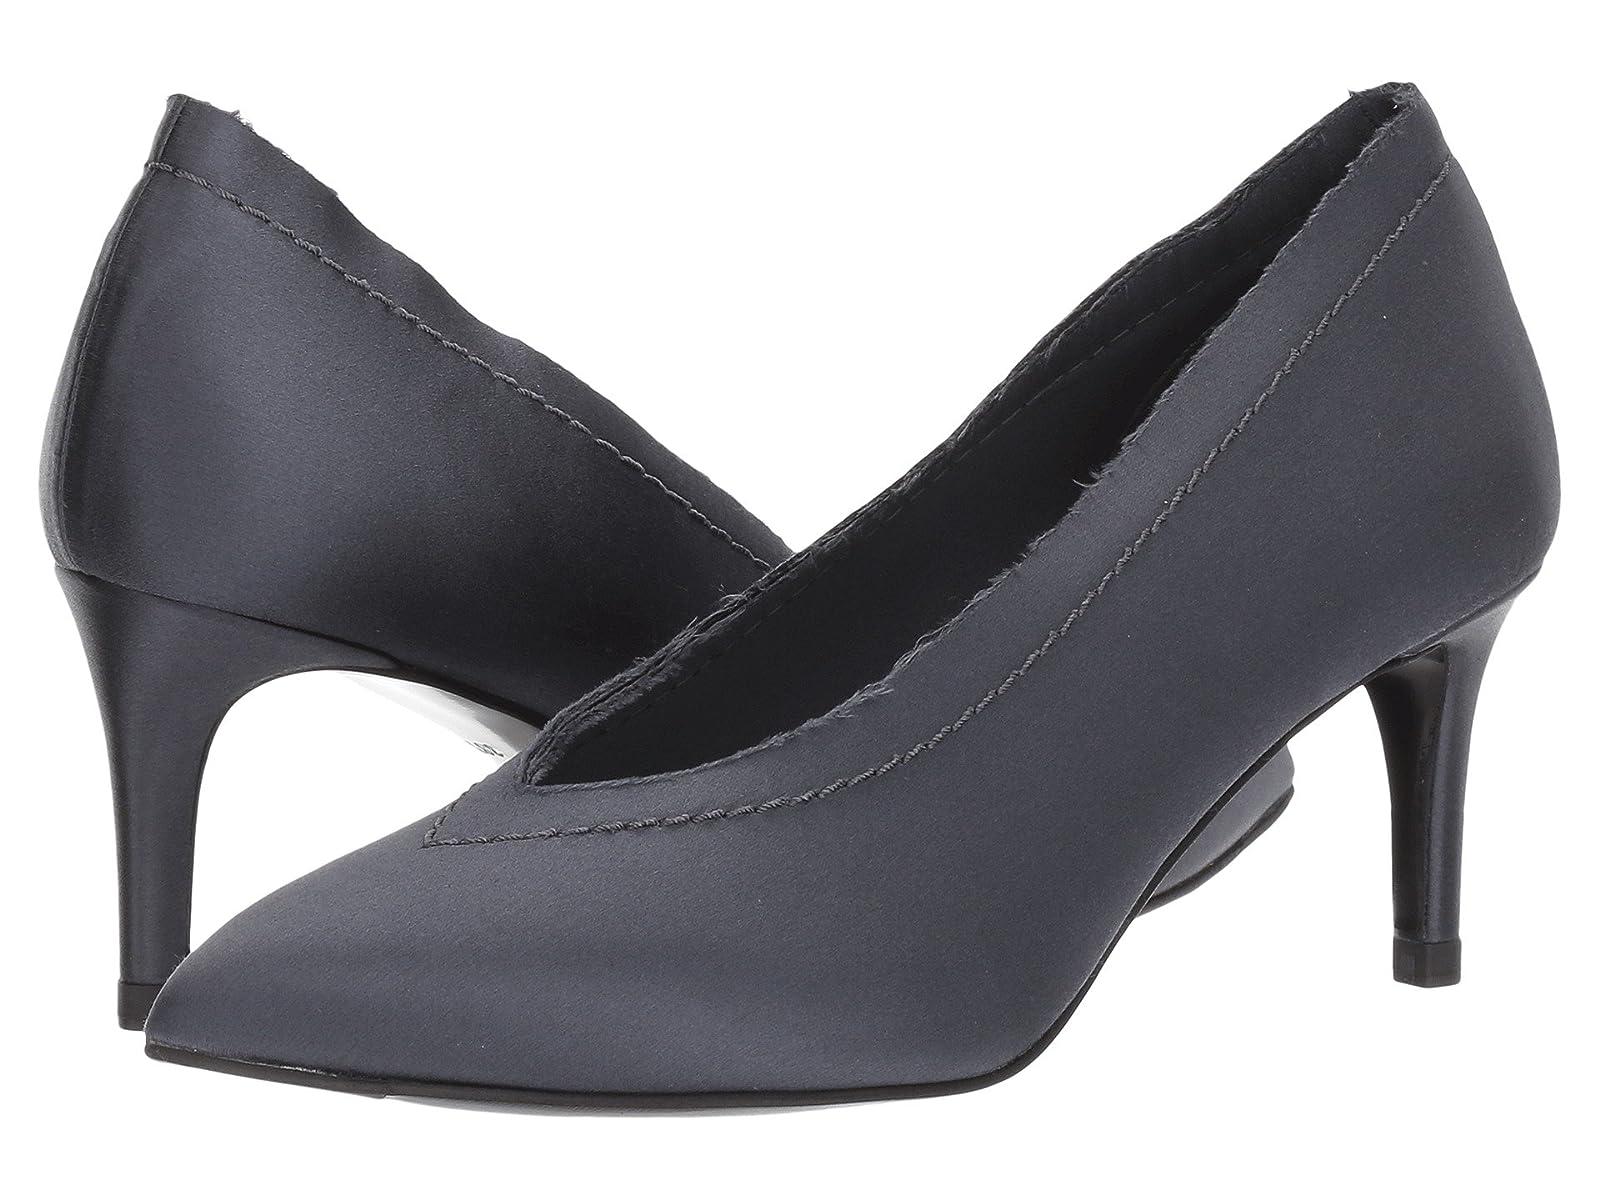 Pedro Garcia ElenaCheap and distinctive eye-catching shoes